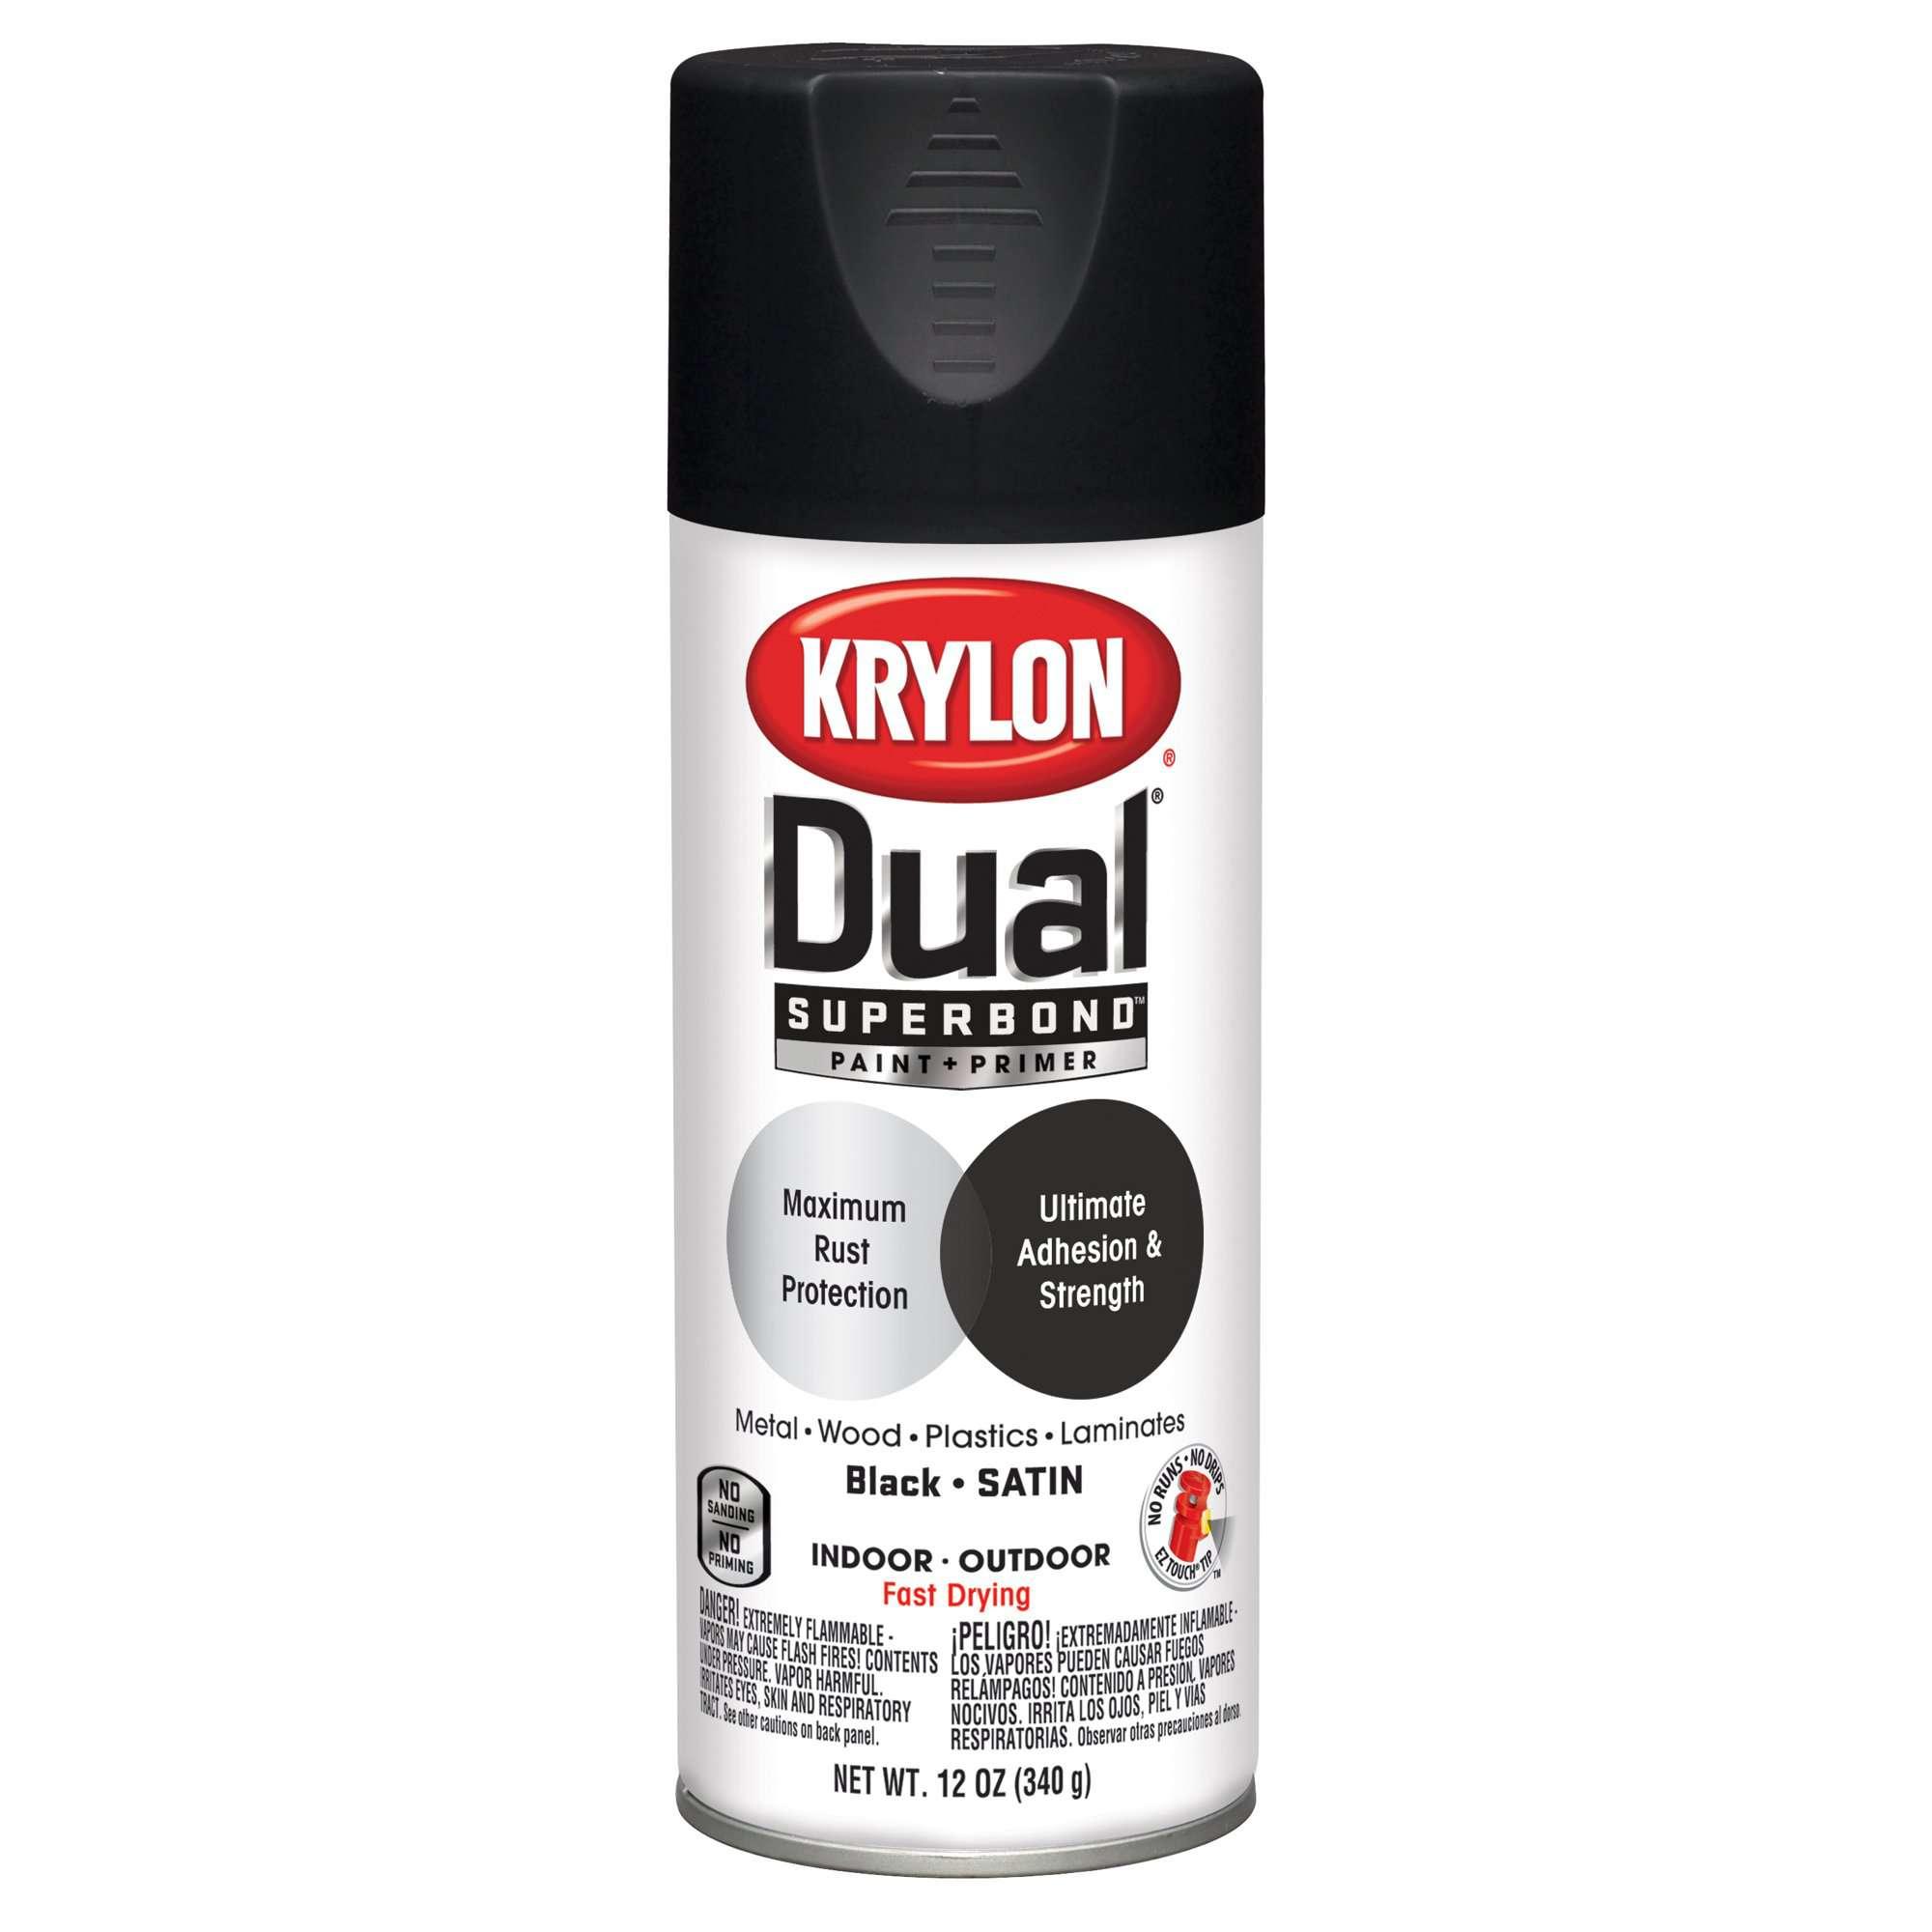 Krylon Dual' Superbond Paint and Primer